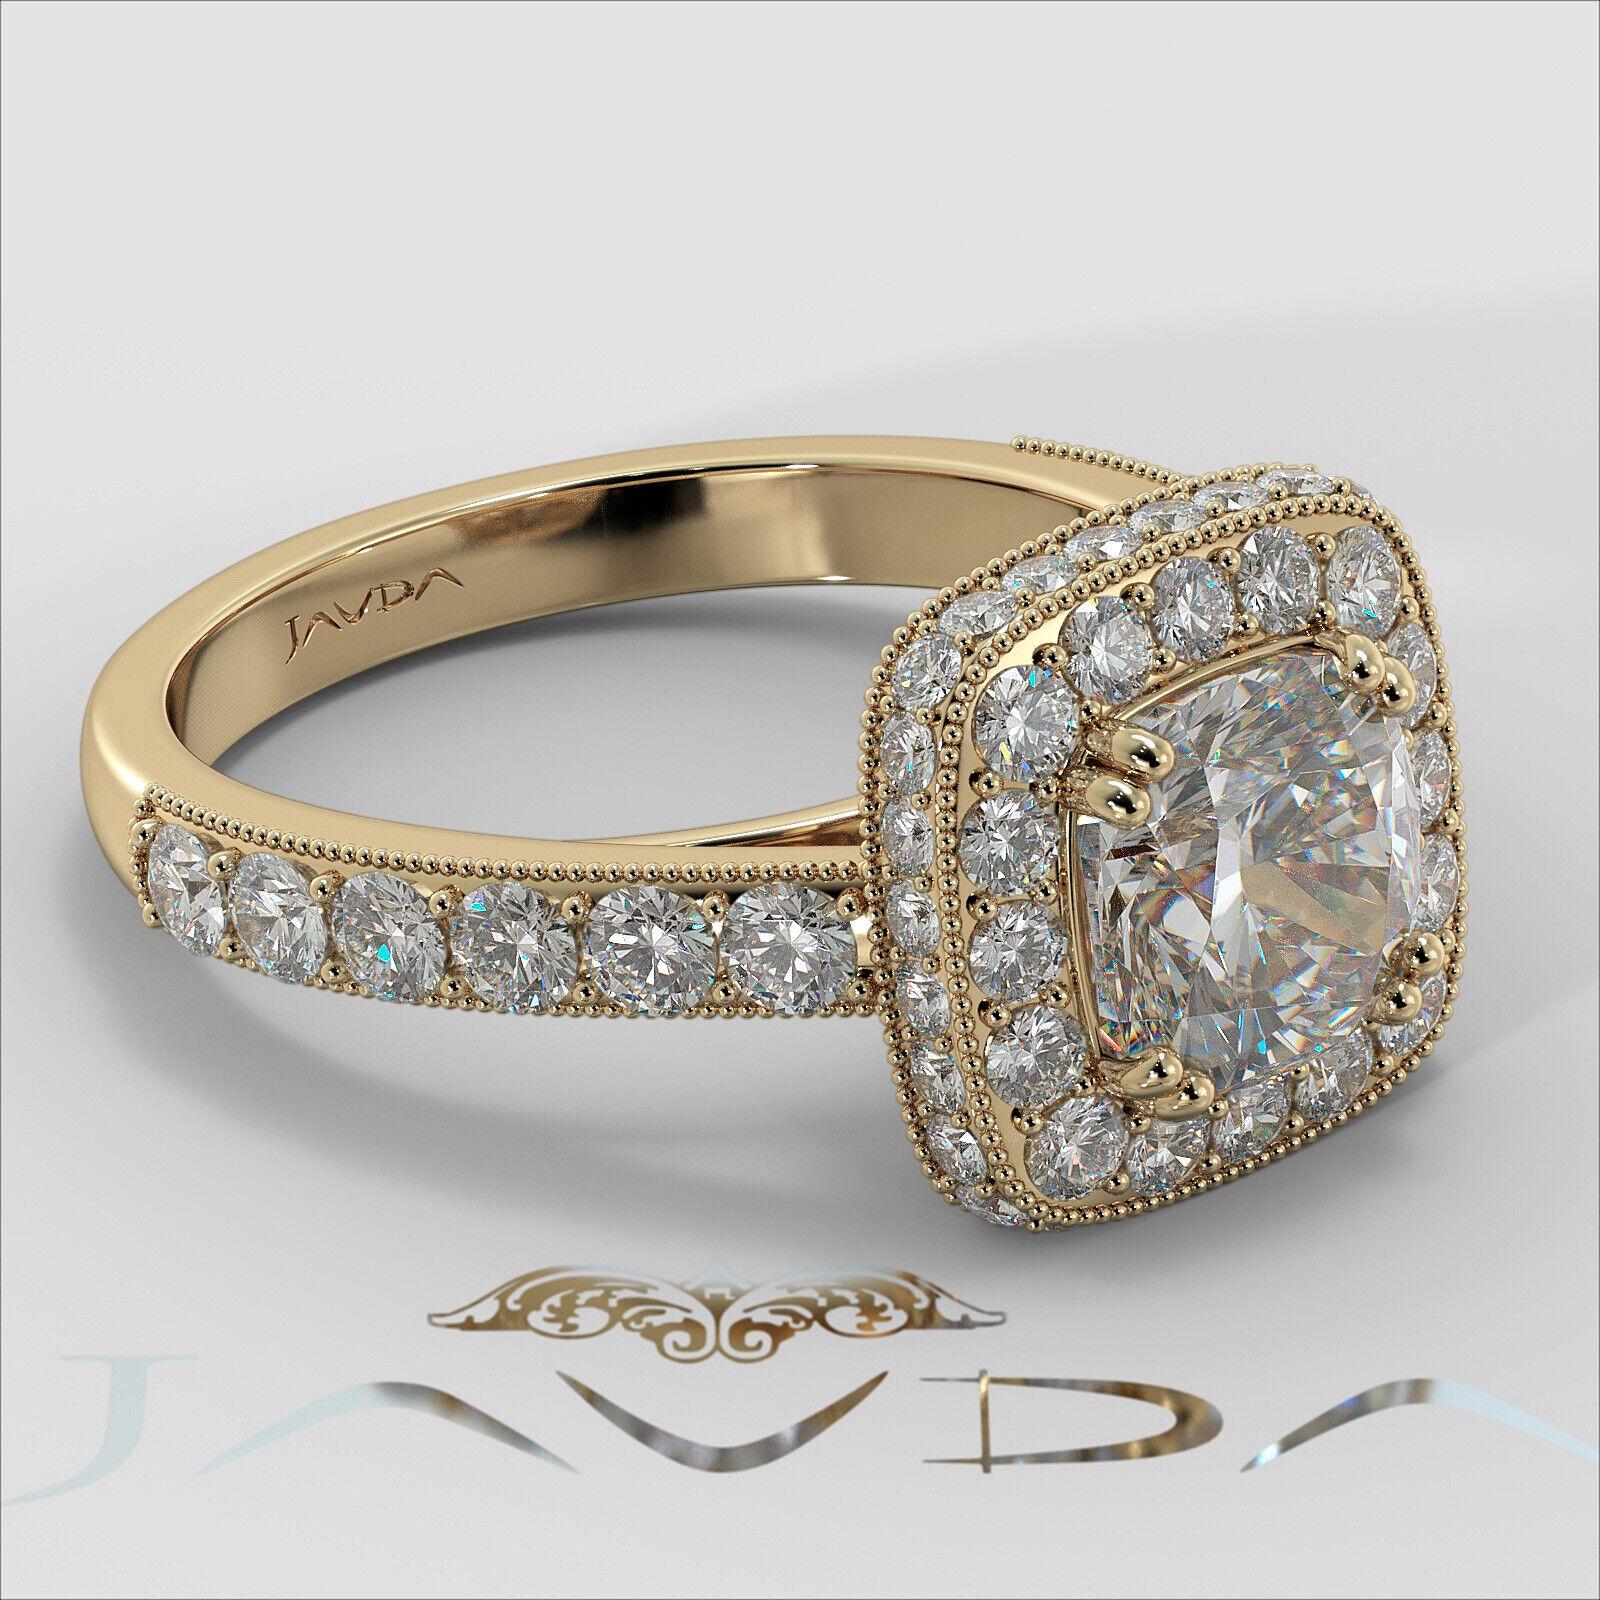 1.94ctw Milgrain Floral Basket Cushion Diamond Engagement Ring GIA E-VVS1 W Gold 9